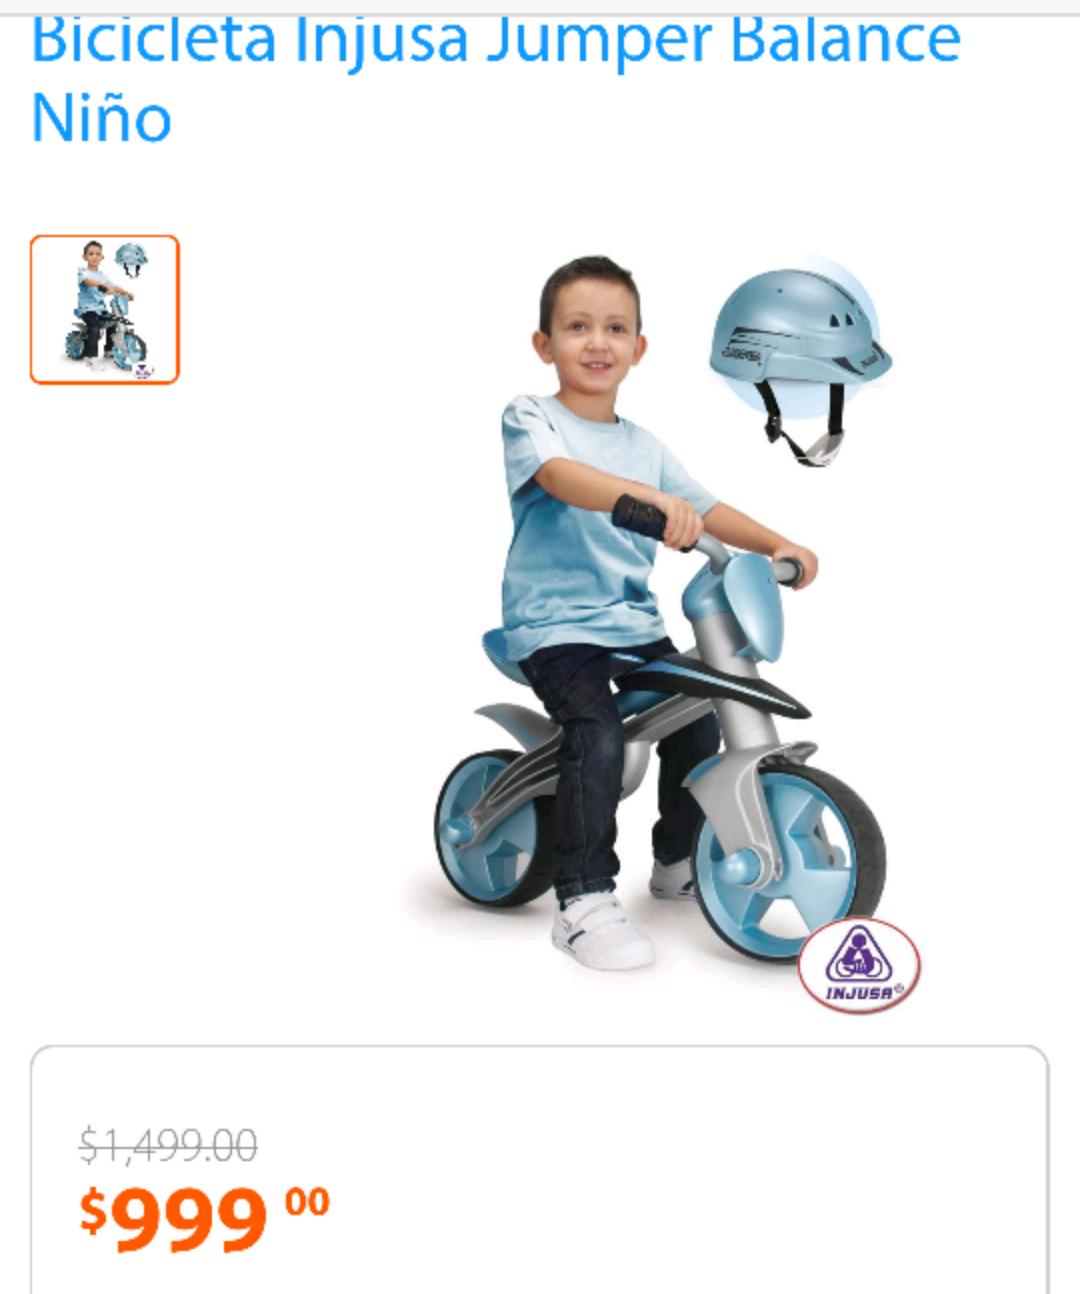 Walmart en línea: bicicleta injusa jumper balance niño a $999